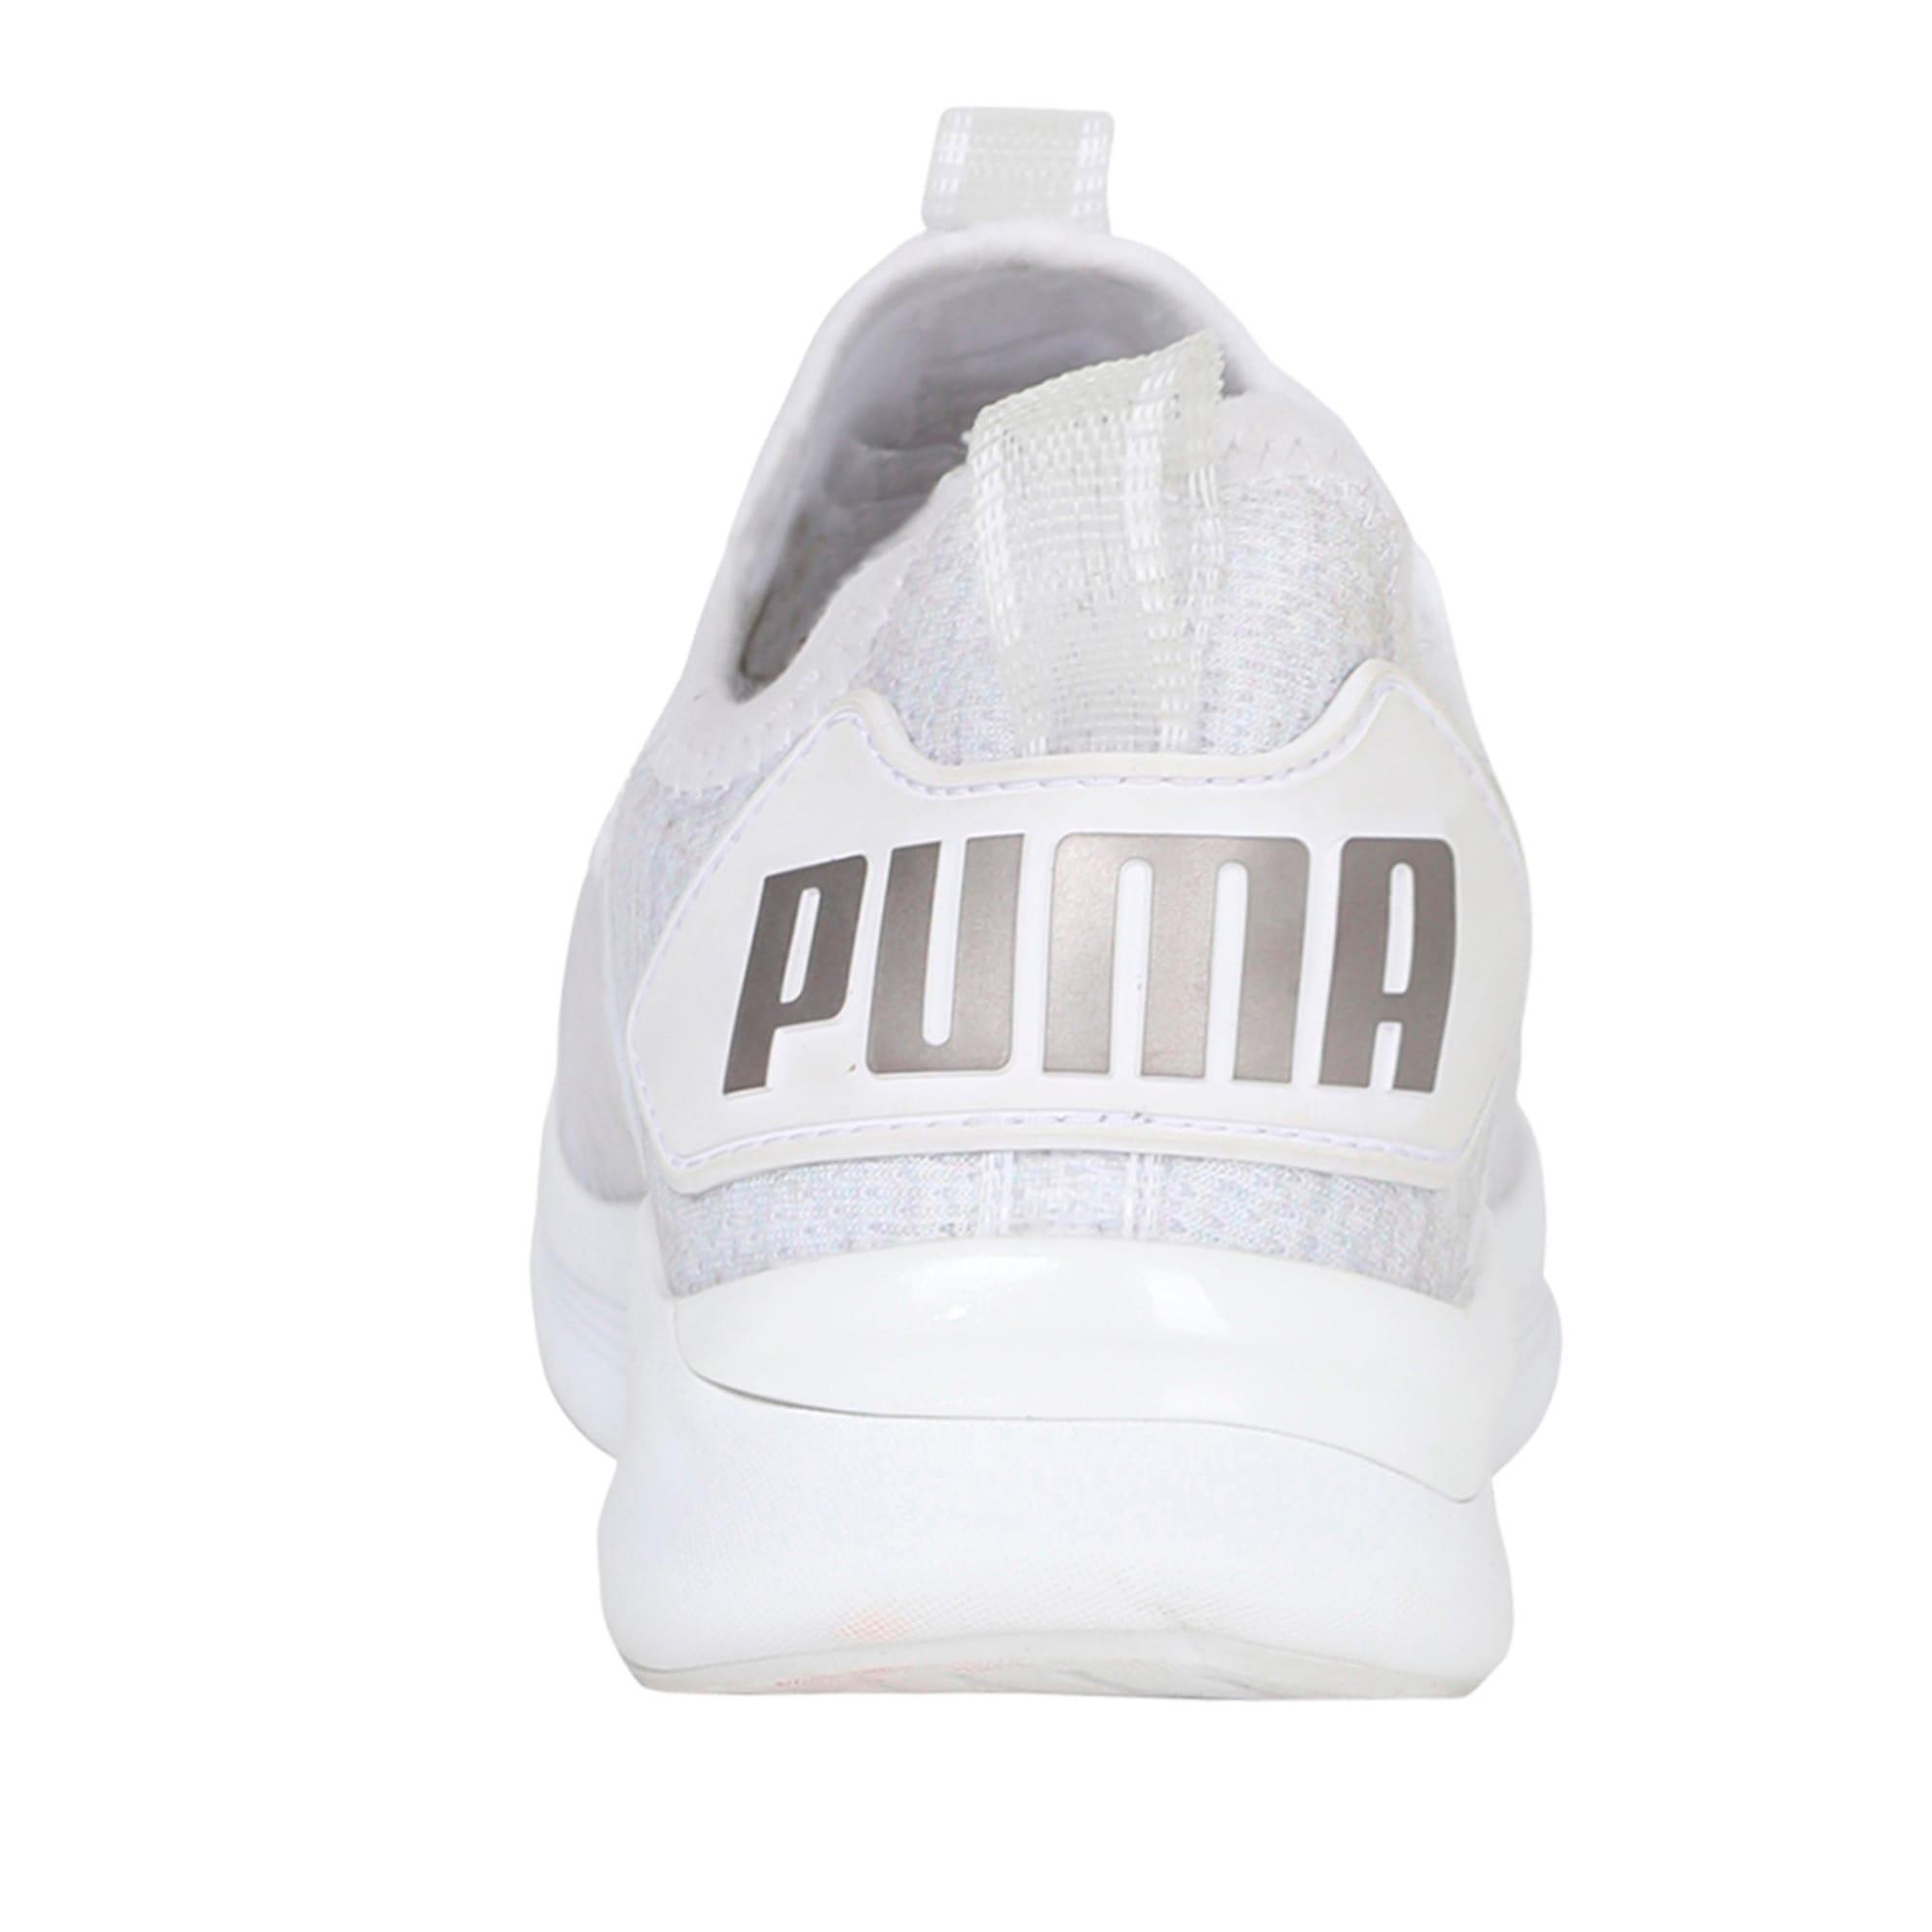 Thumbnail 3 of Flash IGNITE evoKNIT En Pointe Women's Trainers, Puma White-Gray Violet, medium-IND